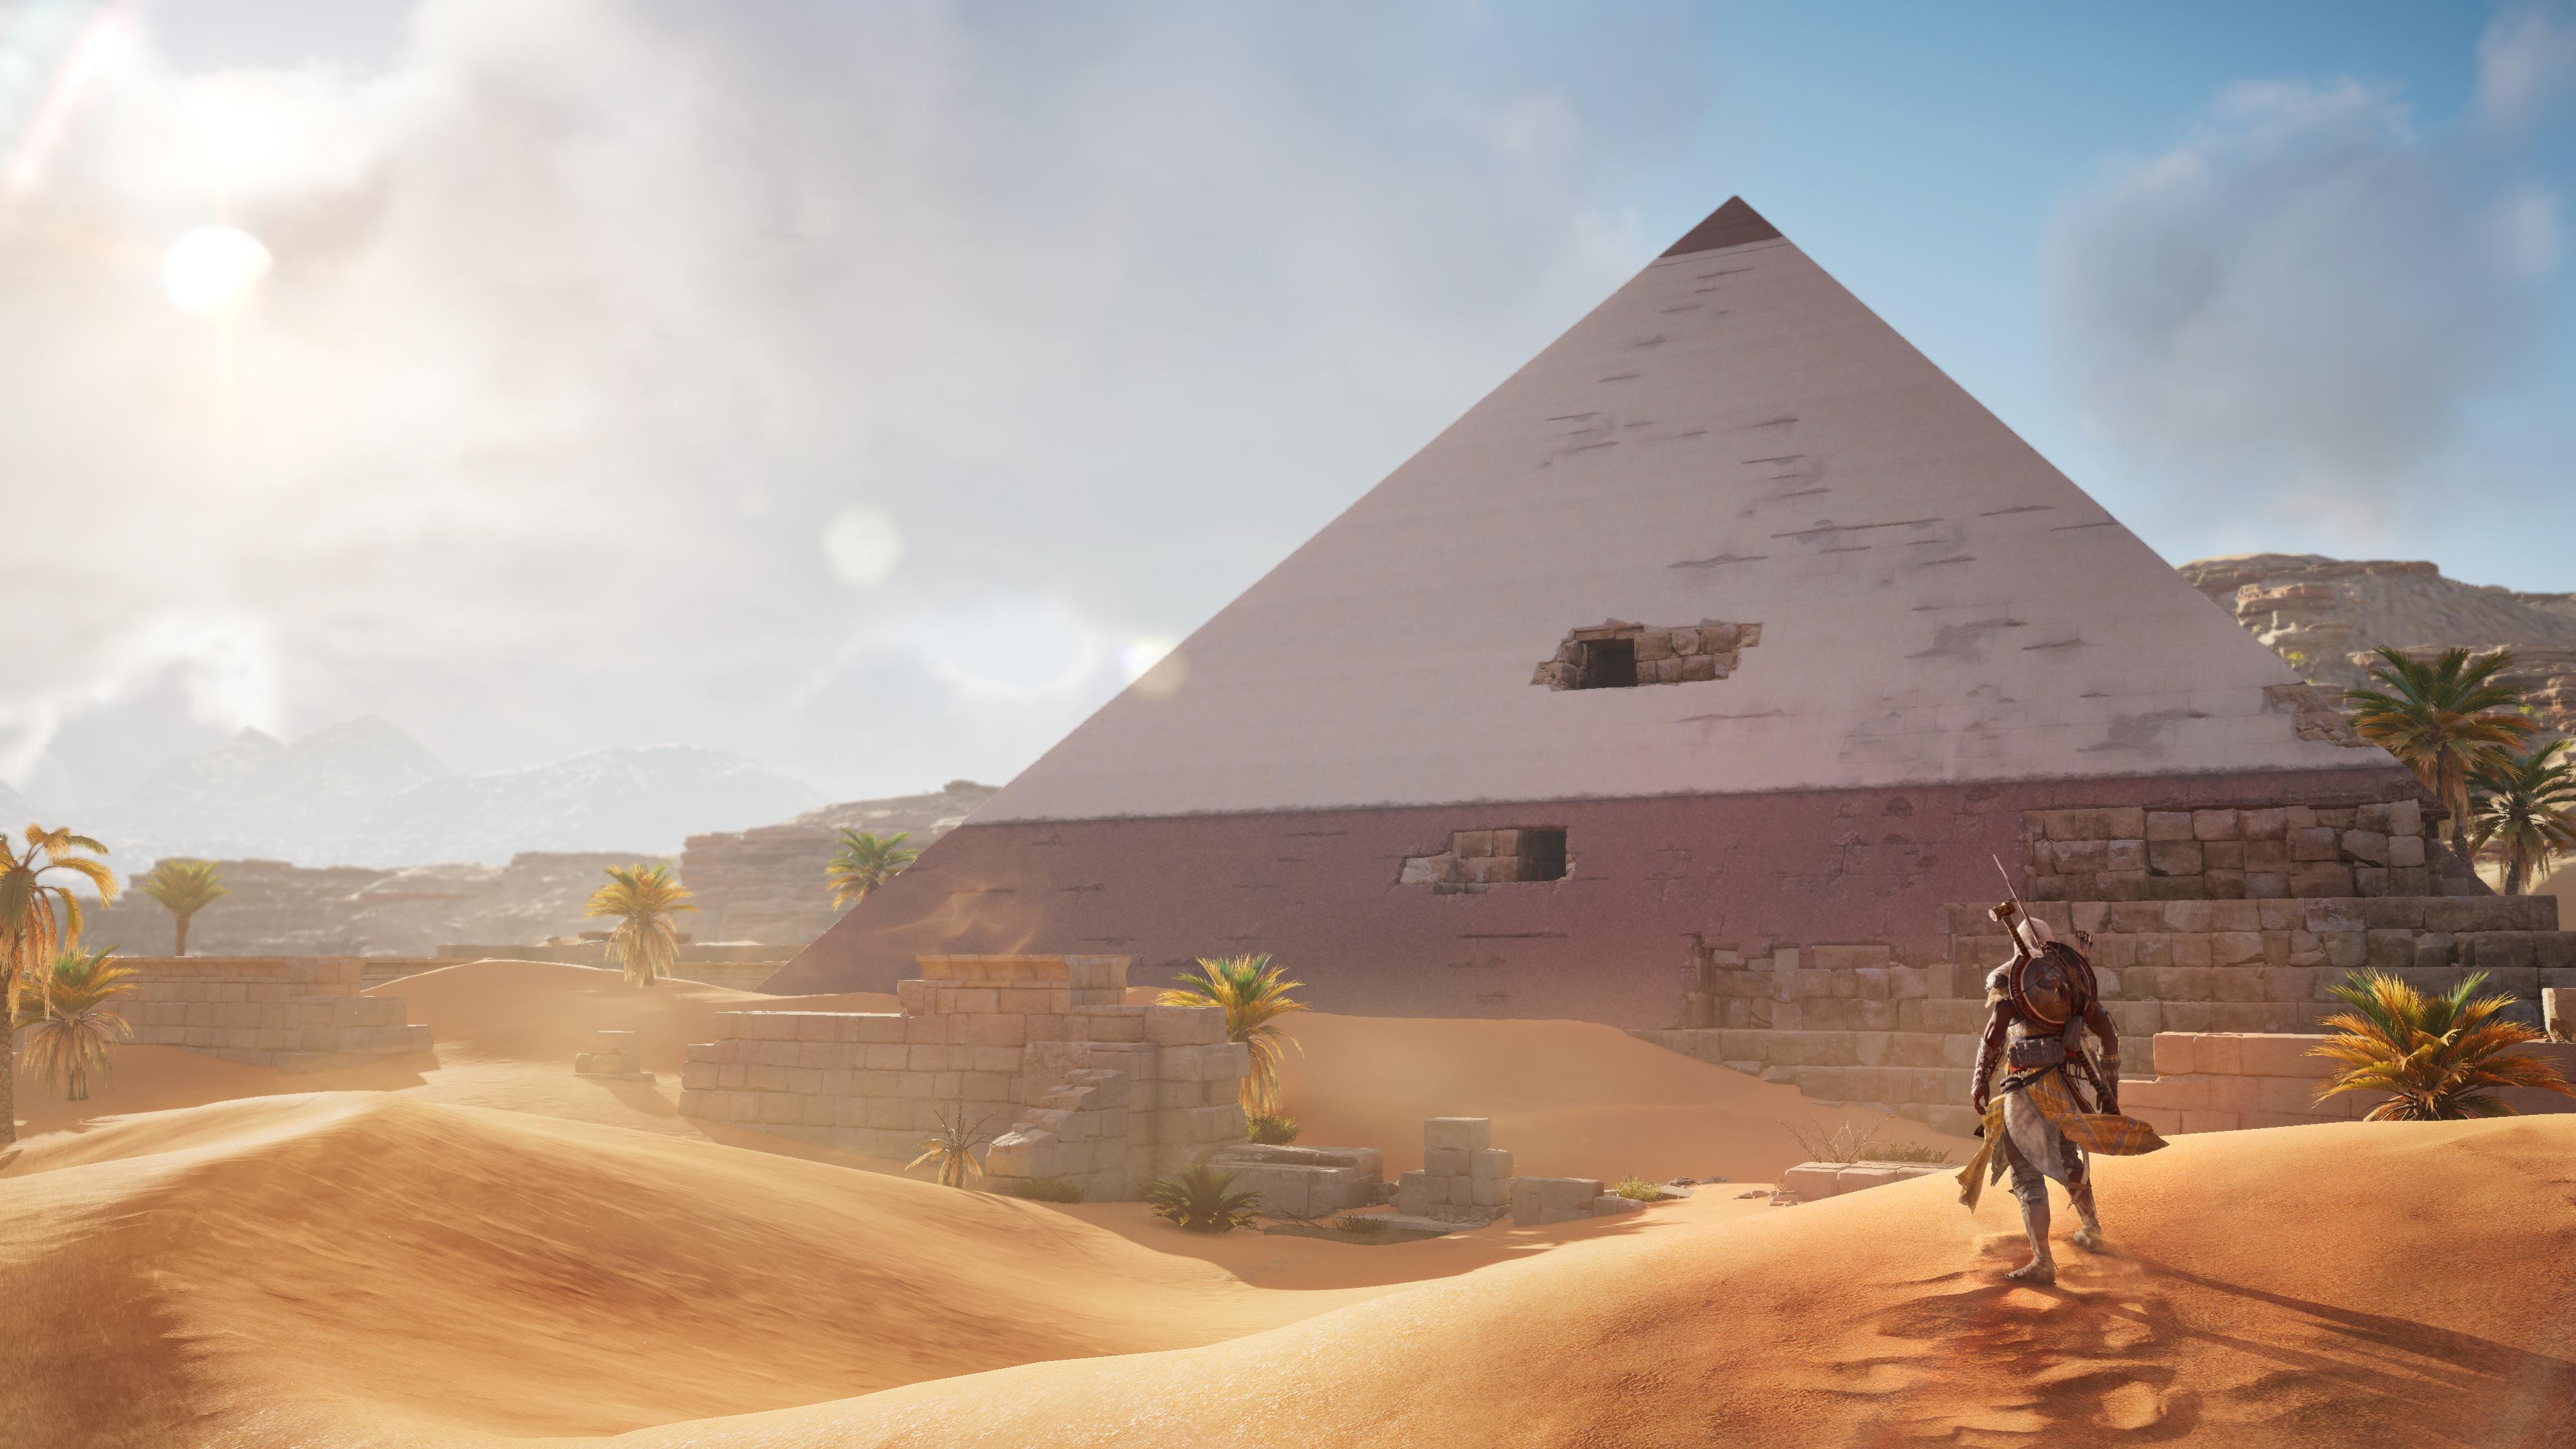 Desktop Wallpaper Assassin S Creed Origins Desert Pyramids Video Game Hd Image Picture Background E5c3a8